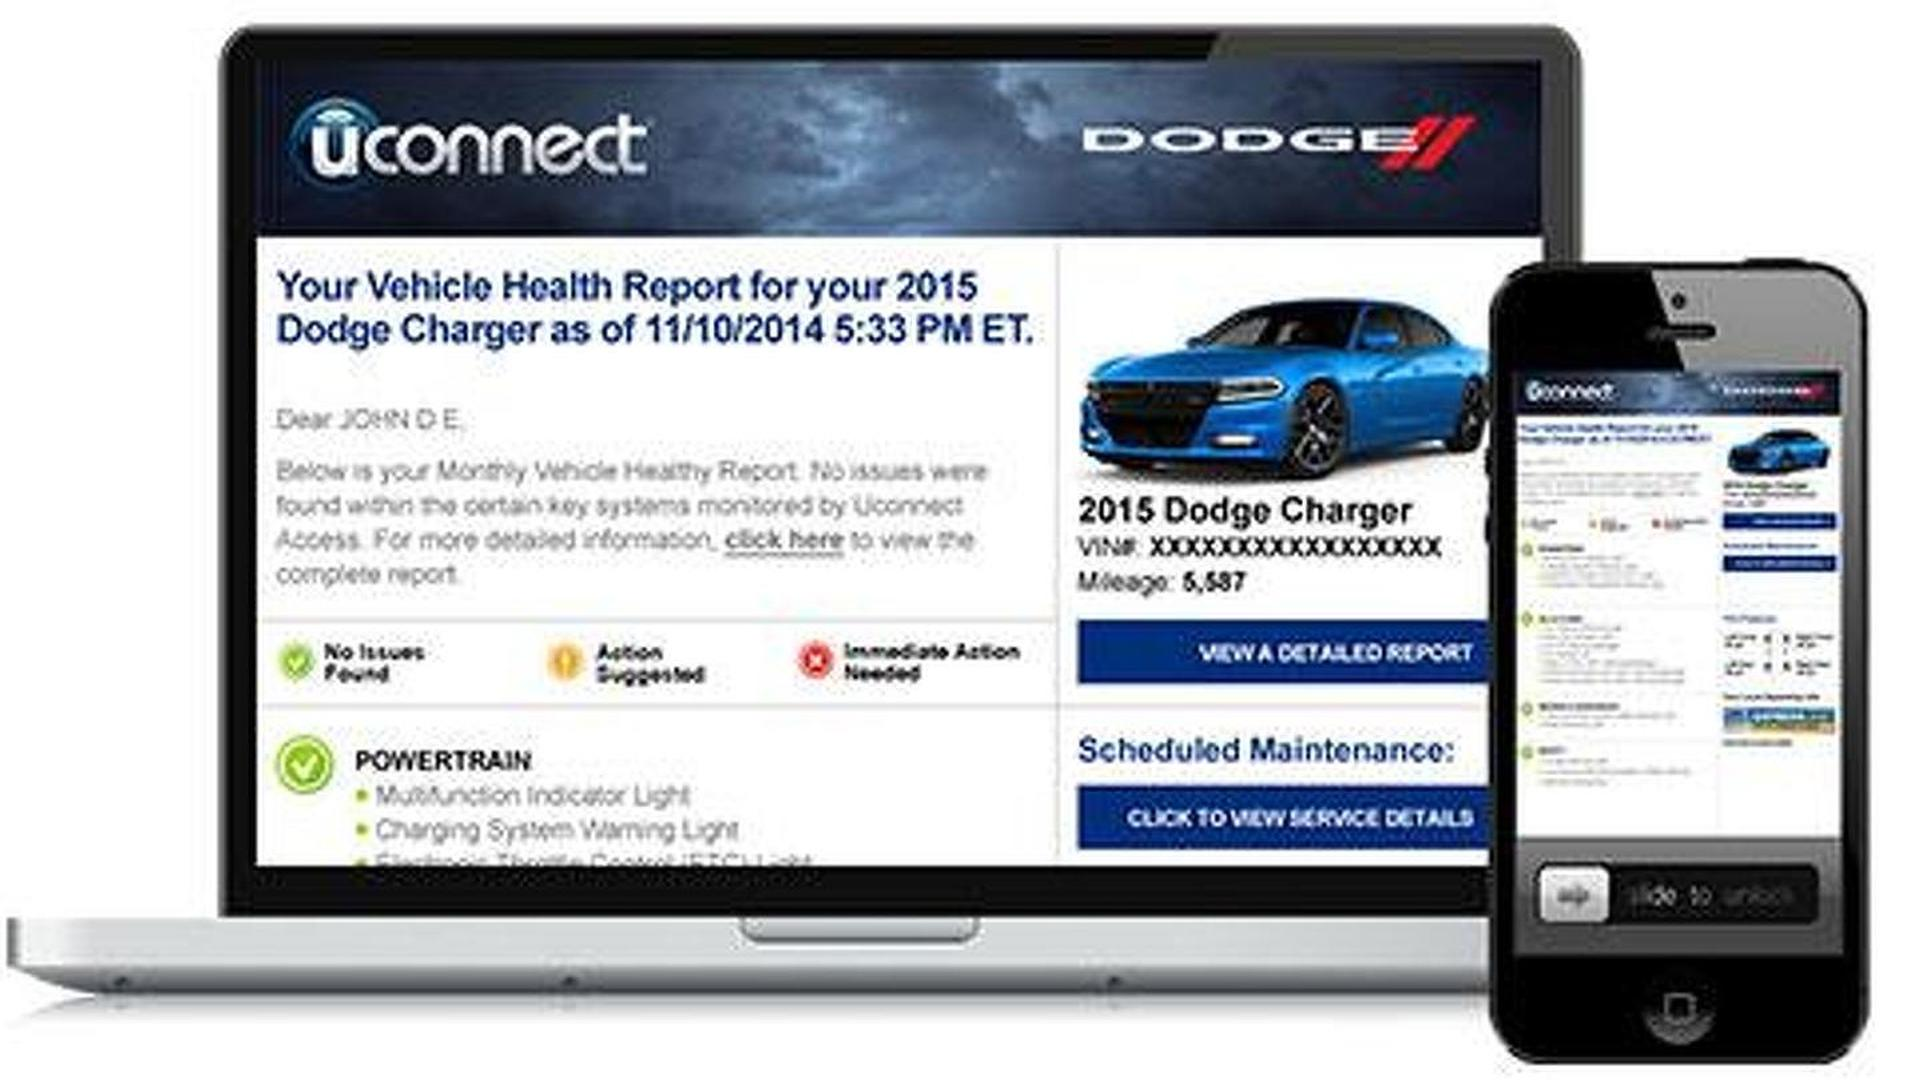 Uconnect Access App >> Chrysler unveils four new Uconnect Access services at CES [videos] | Motor1.com